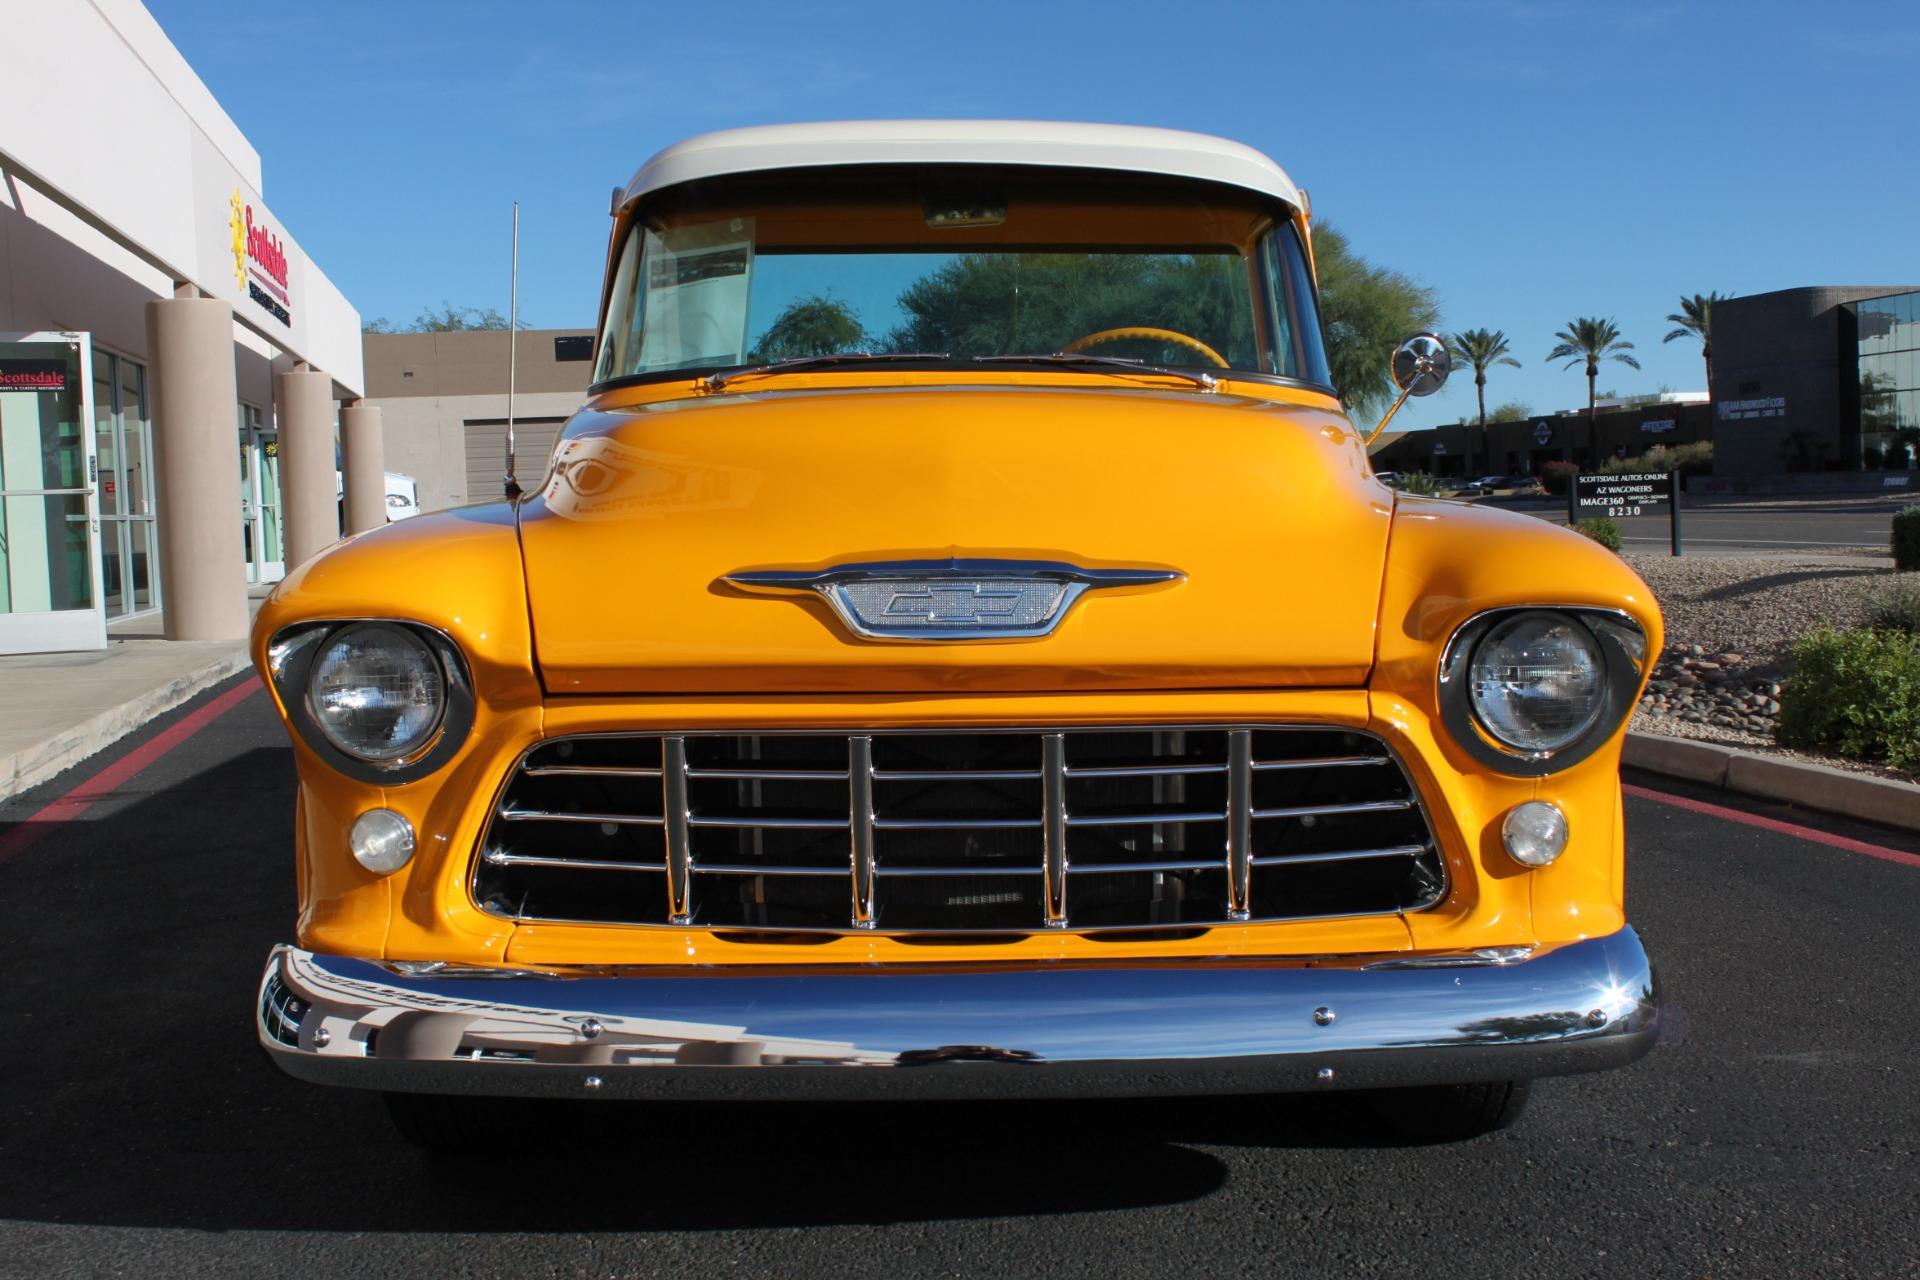 Used-1955-Chevrolet-3100-Pickup-Truck-Cherokee